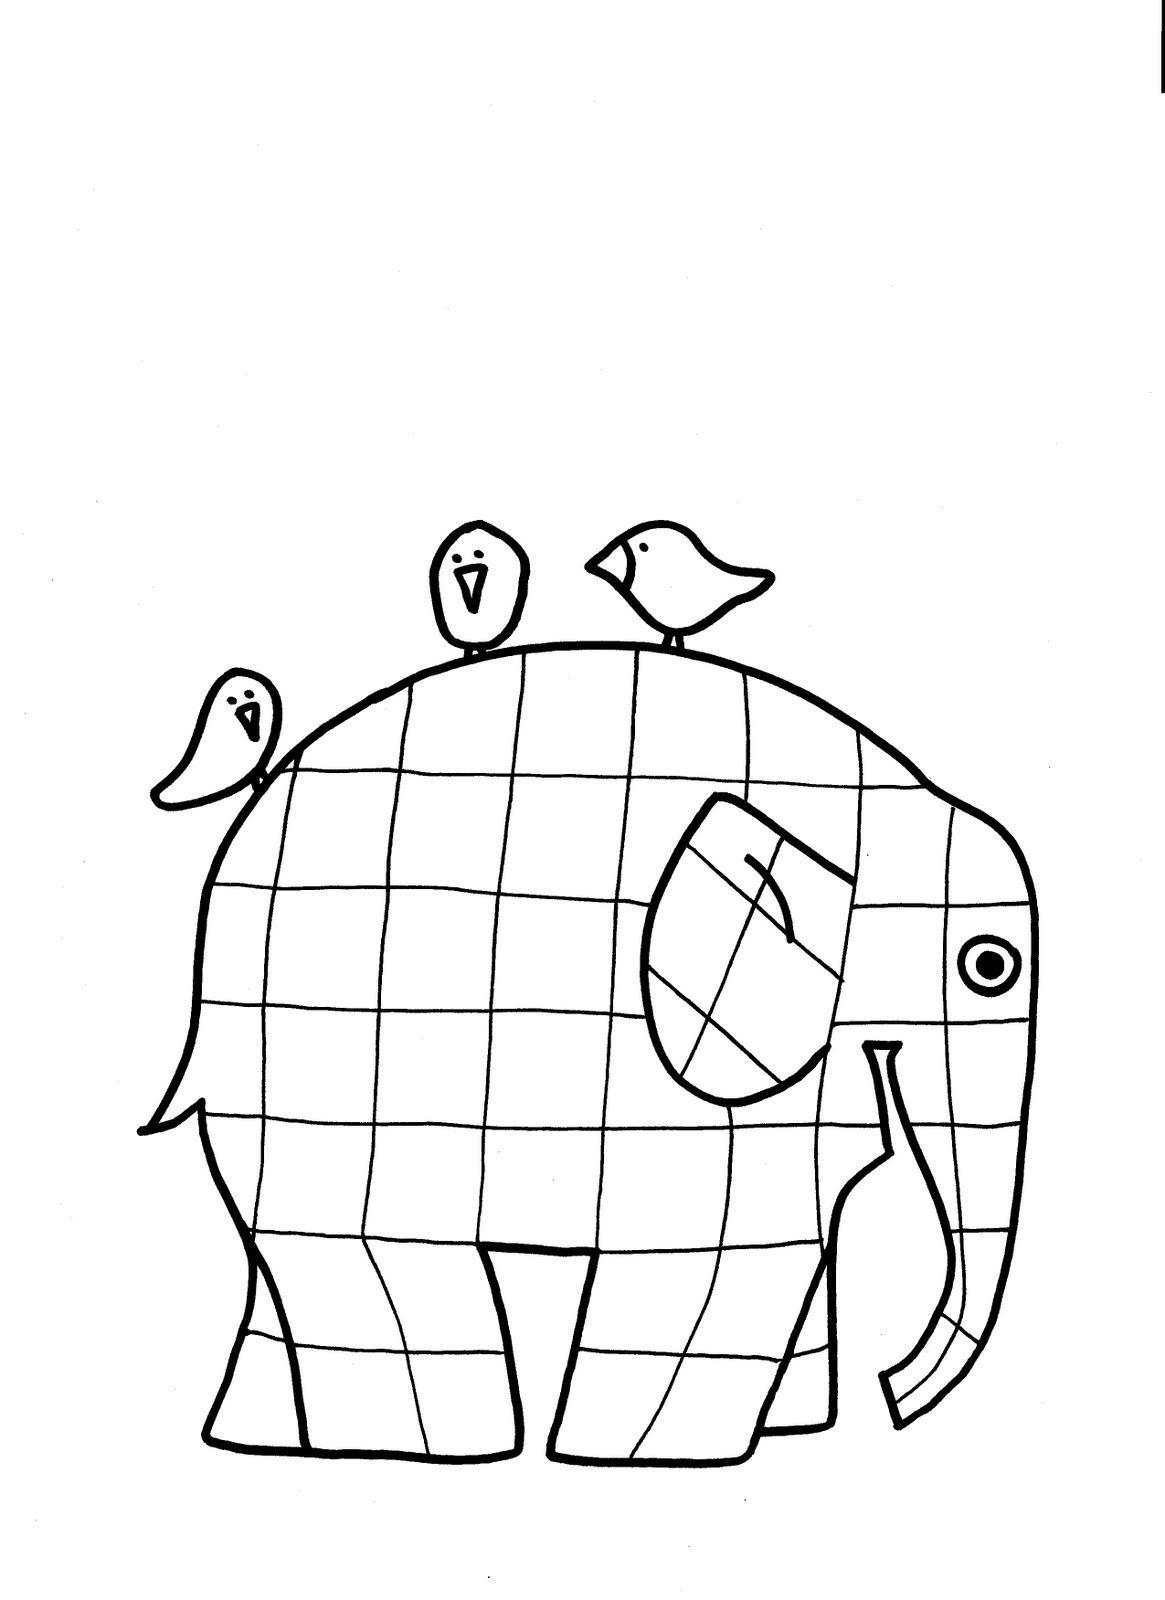 Ausmalbild Elmar Elefant   Kinder Ausmalbilder